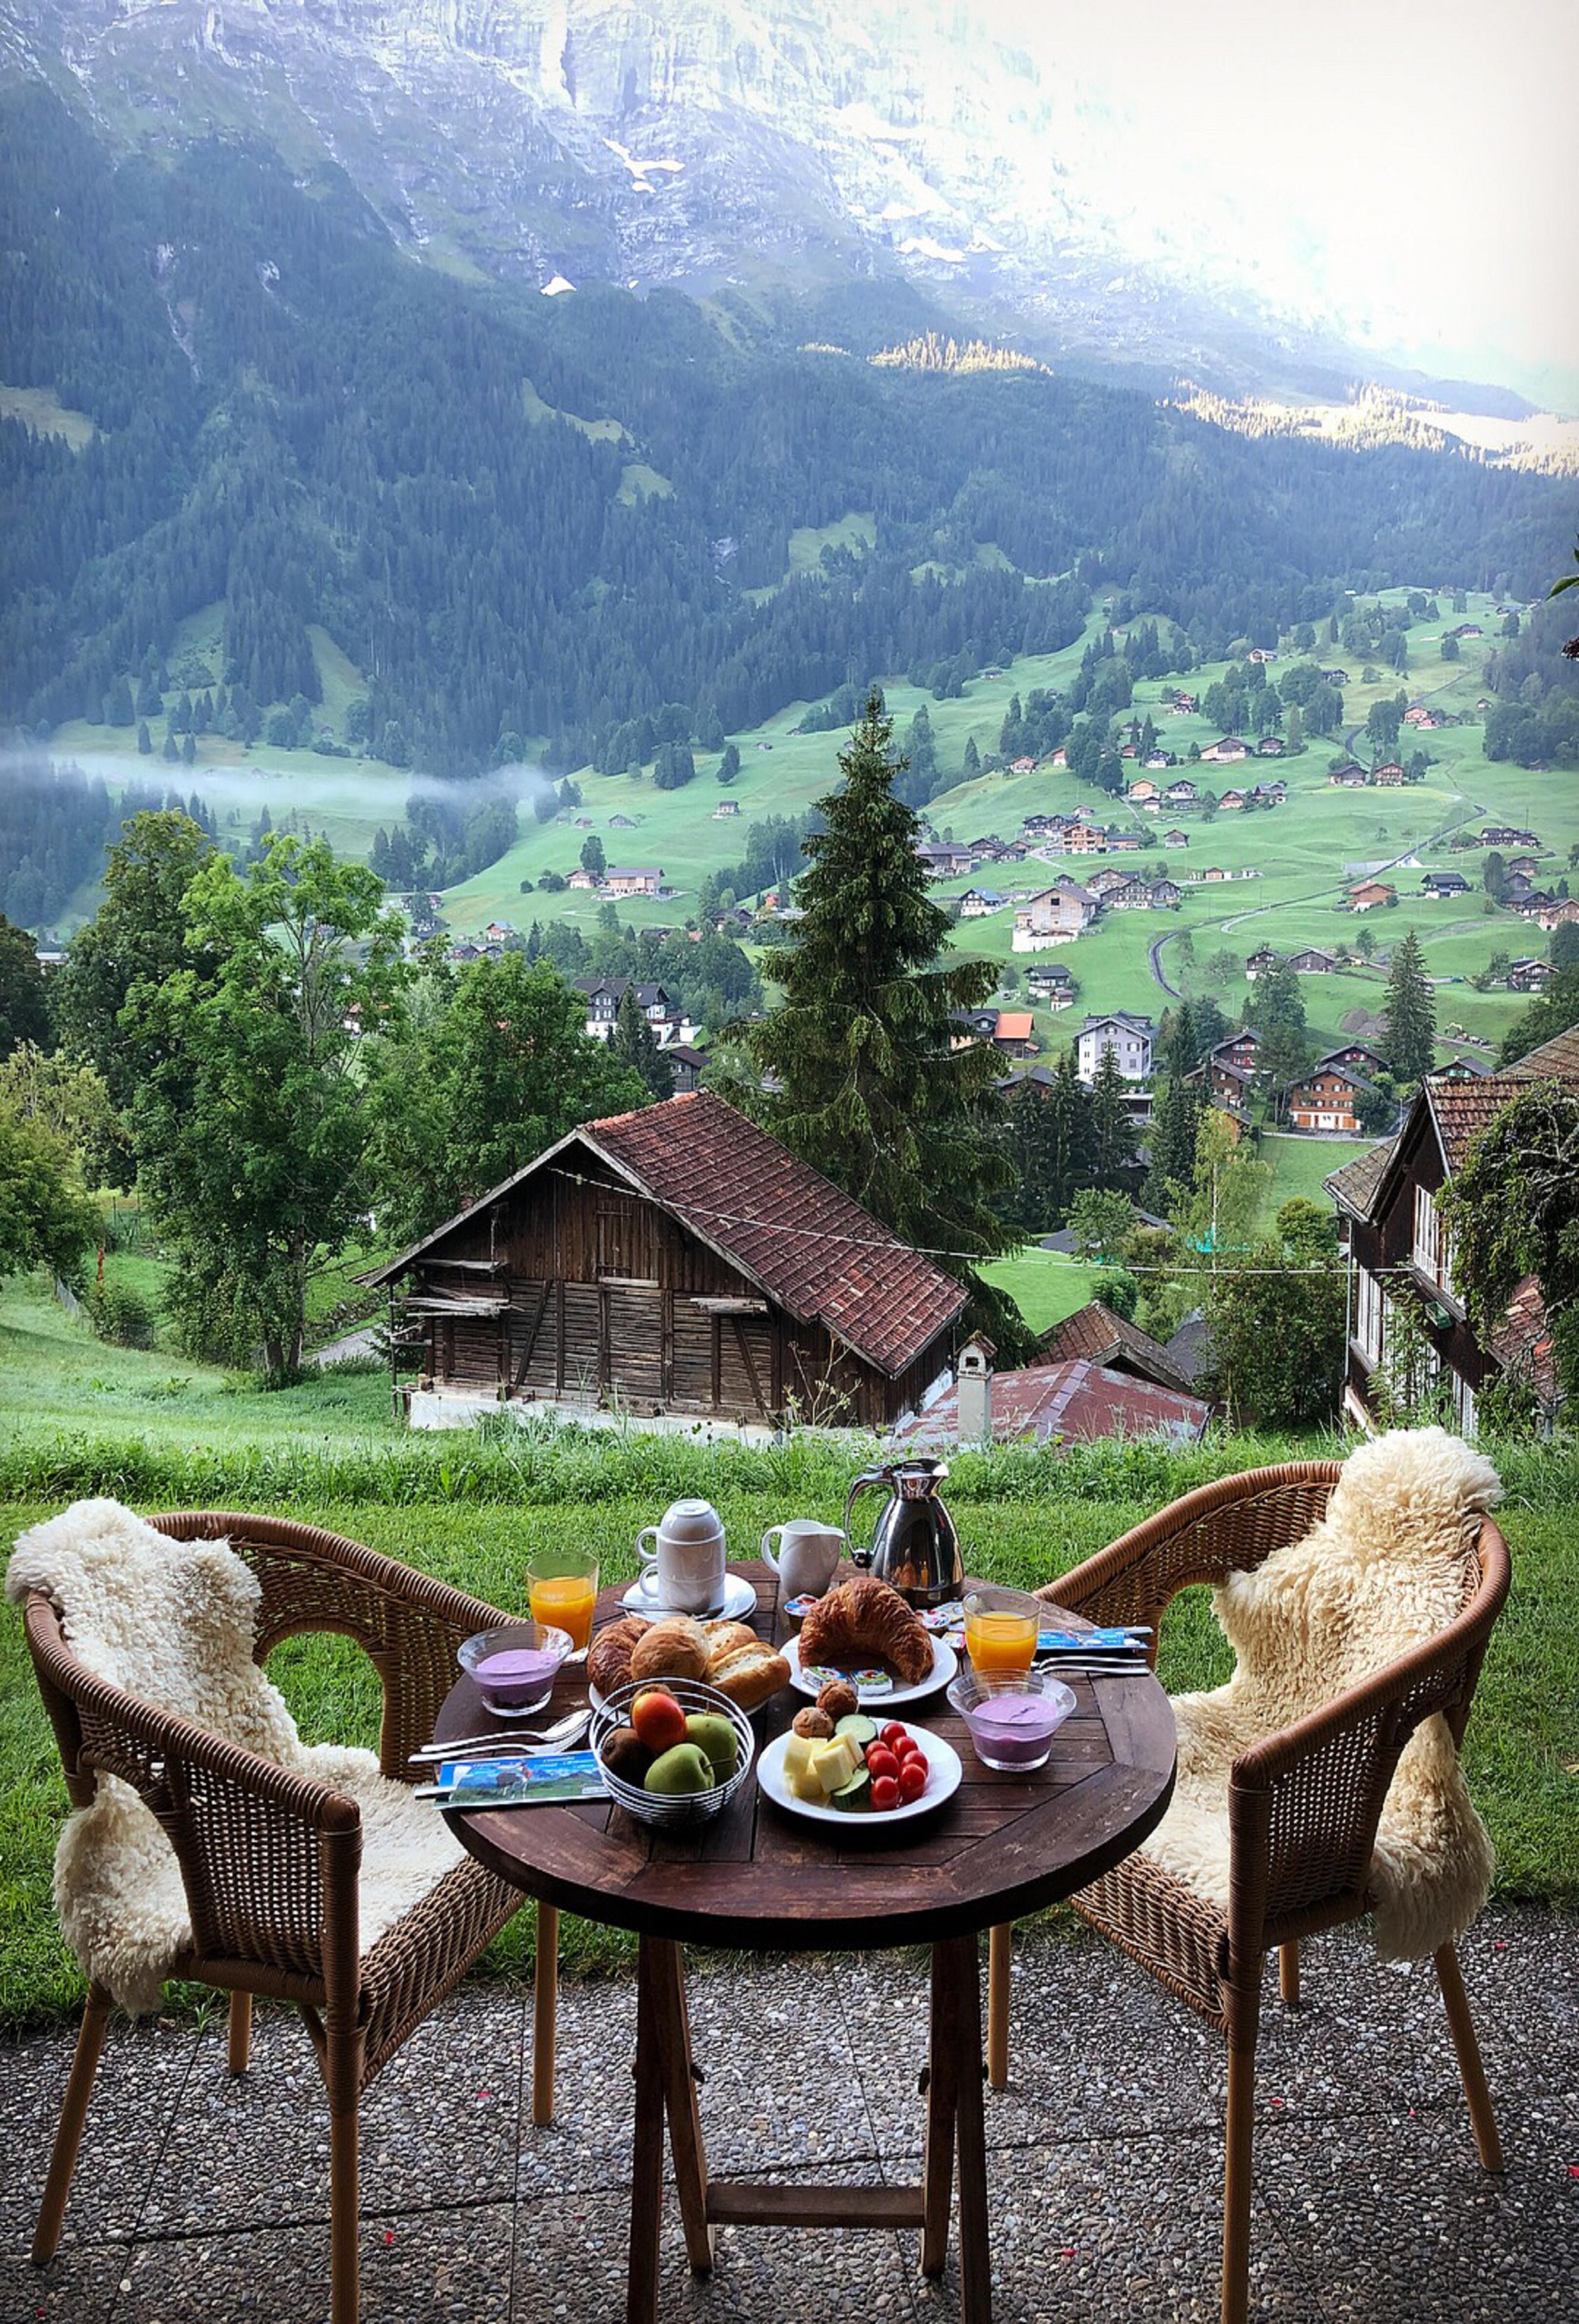 завтрак на природе фото белове